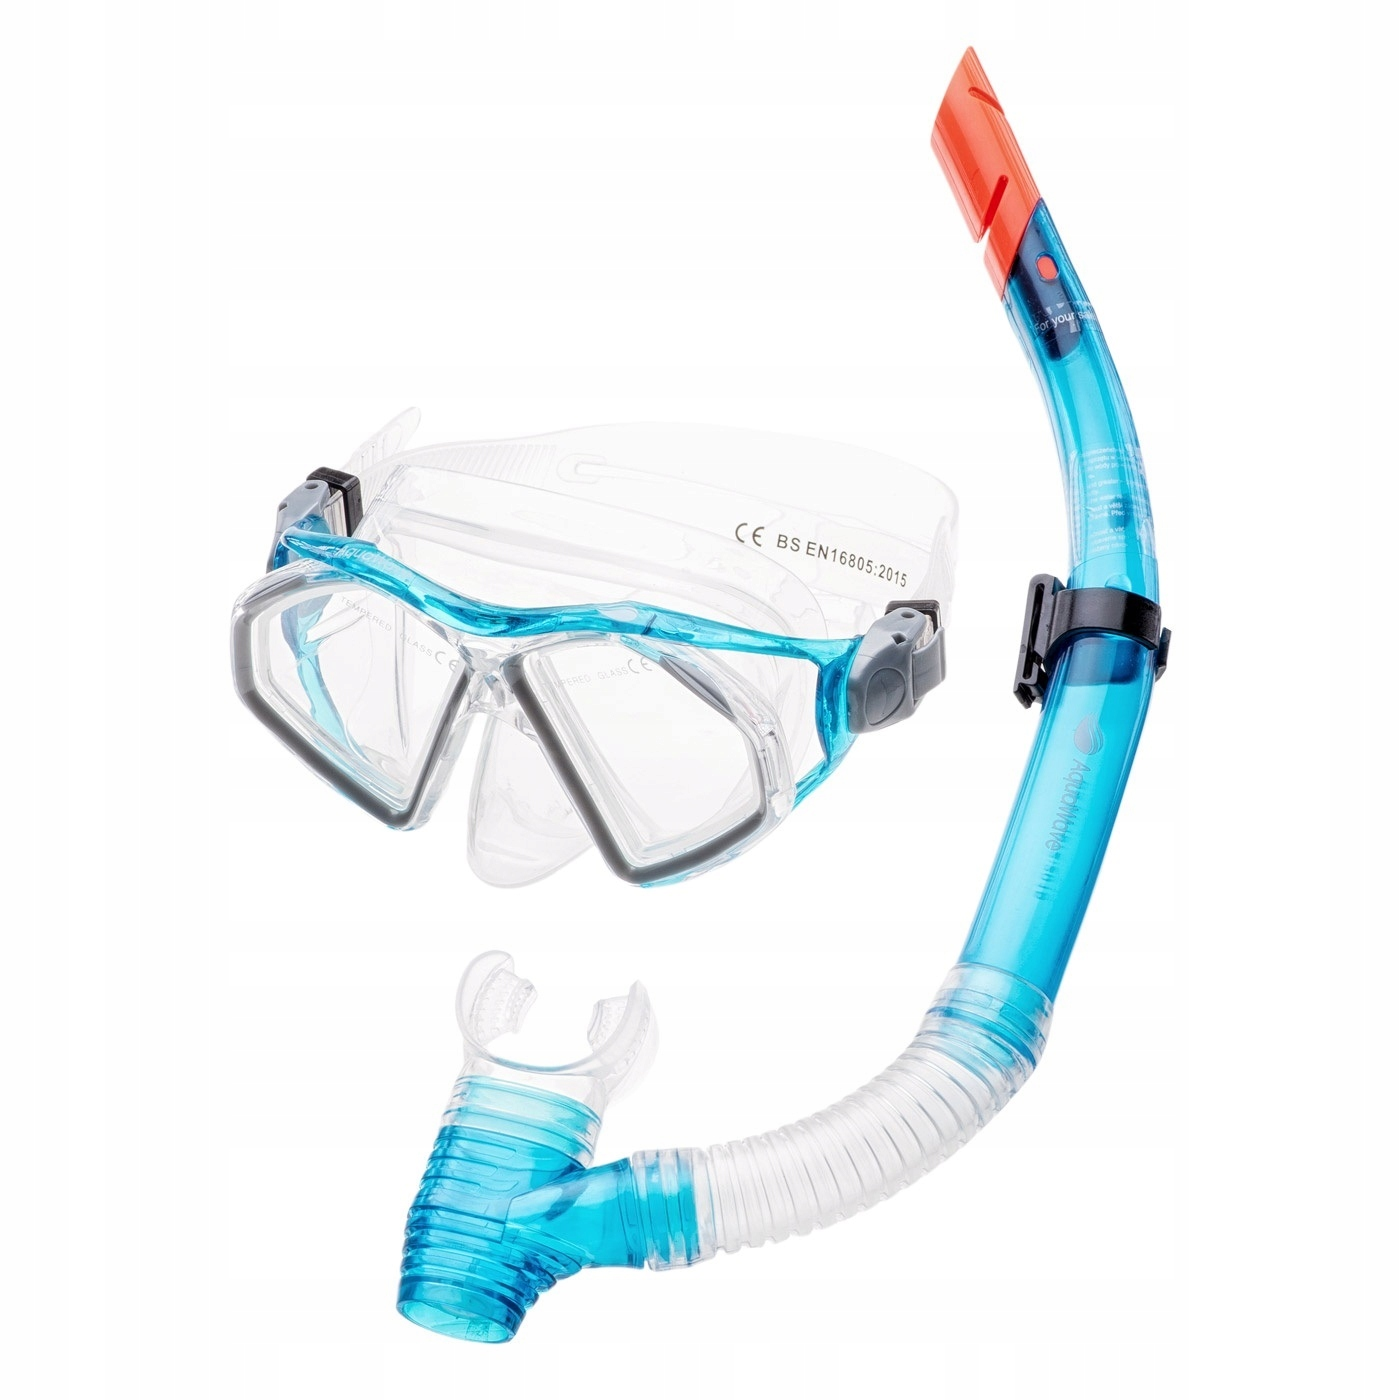 4162daa0be2d Rurka + Maska do pływania Aquawave Seal Set - 7389984322 - oficjalne ...